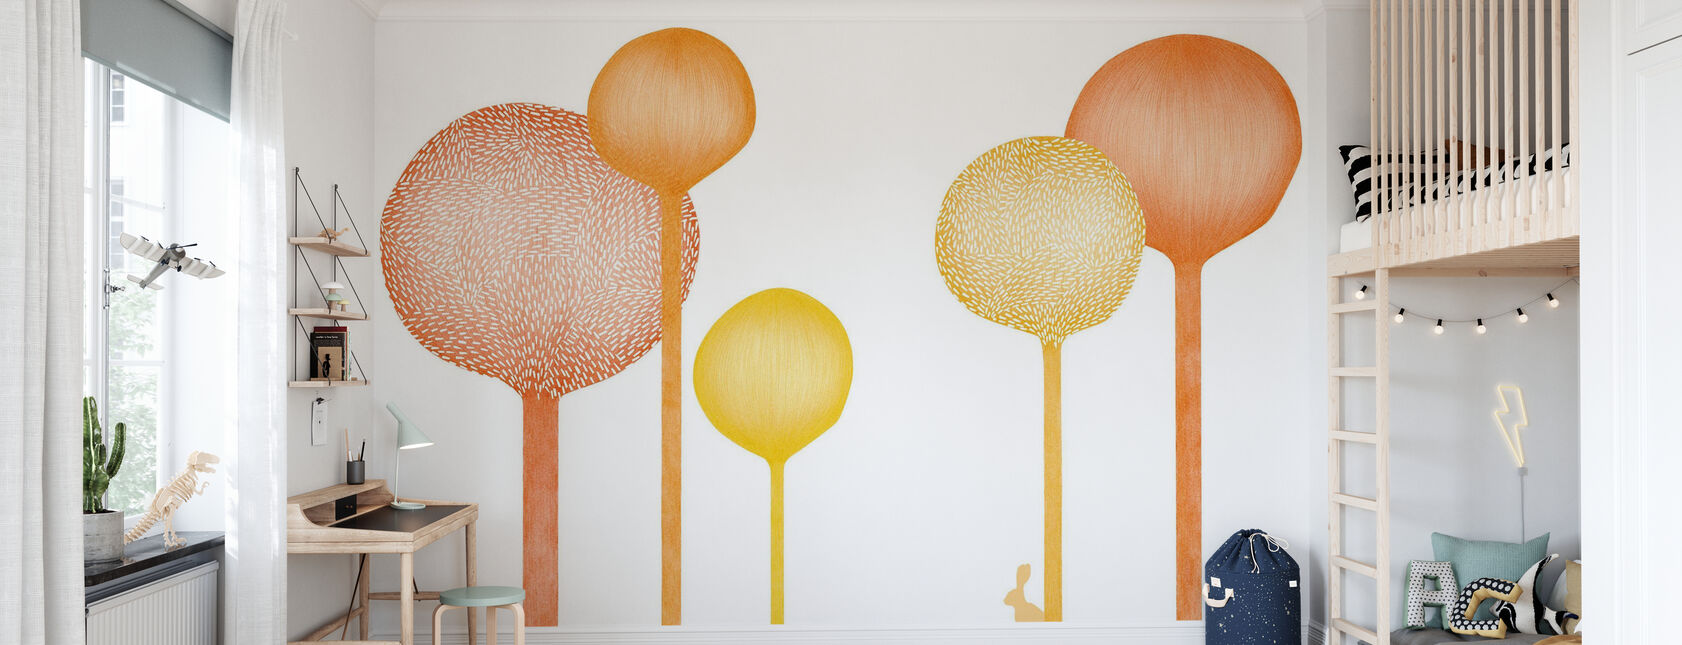 Studio Rita | Elin Öhrling - Skogskape - Orange - Tapet - Barnerom